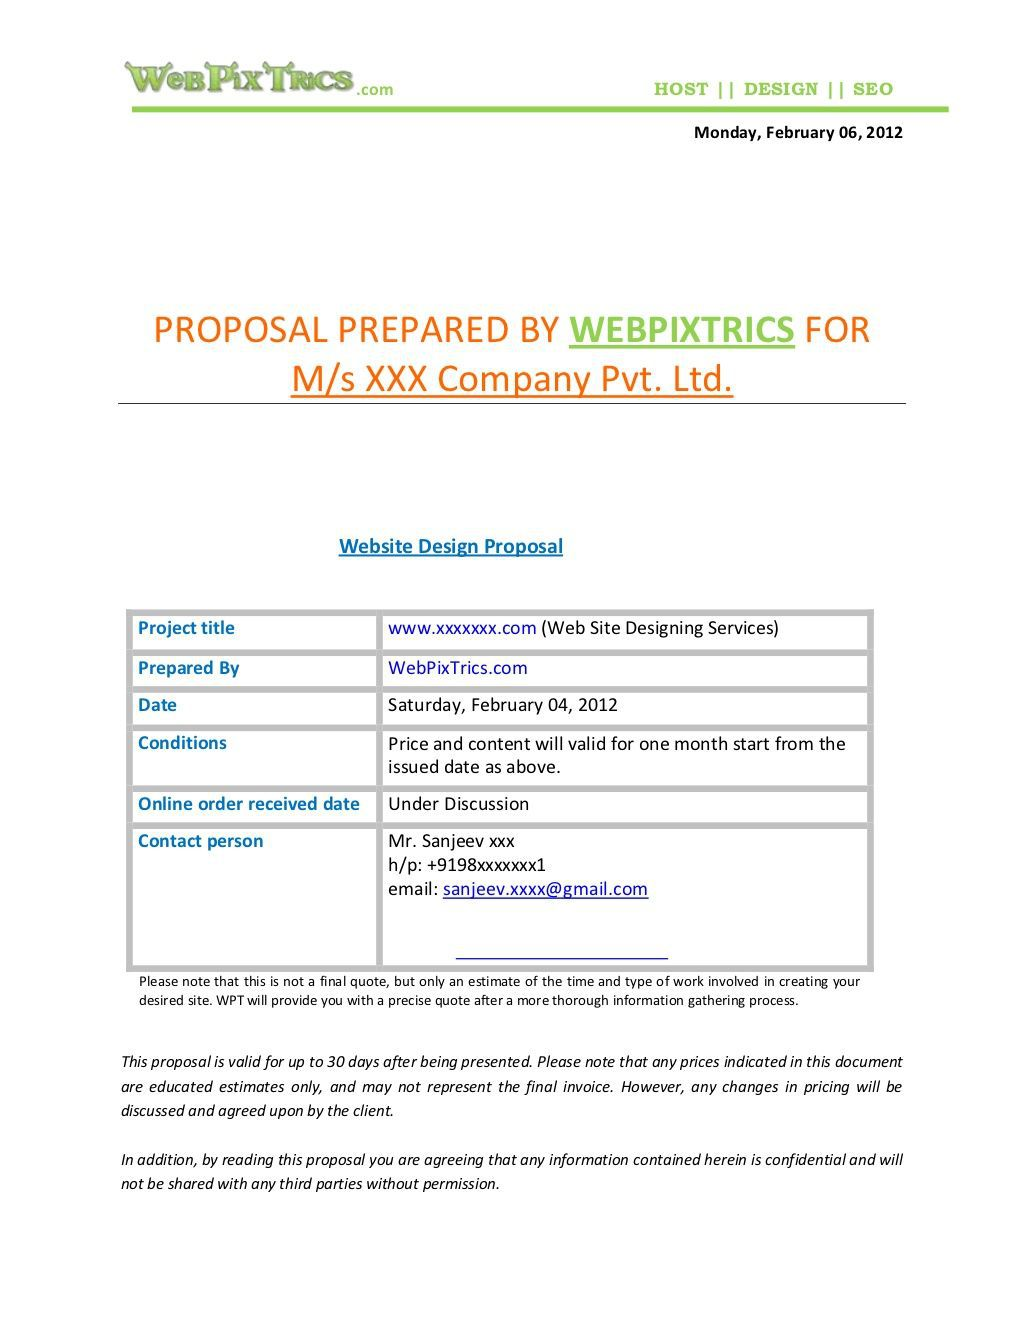 007 Unbelievable Freelance Website Design Proposal Template High Def Full